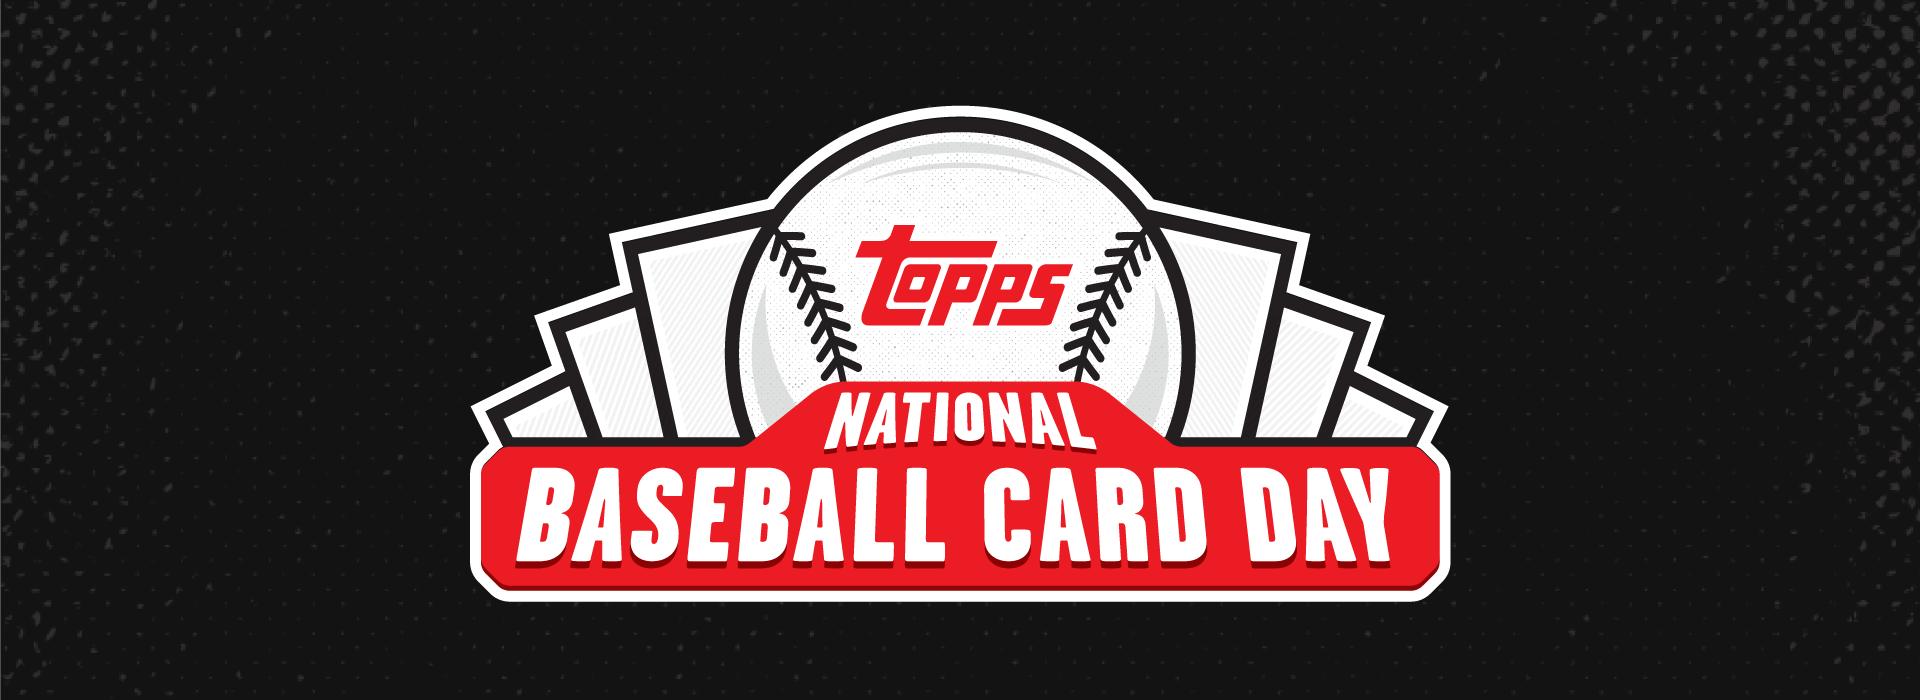 National Baseball Card Day